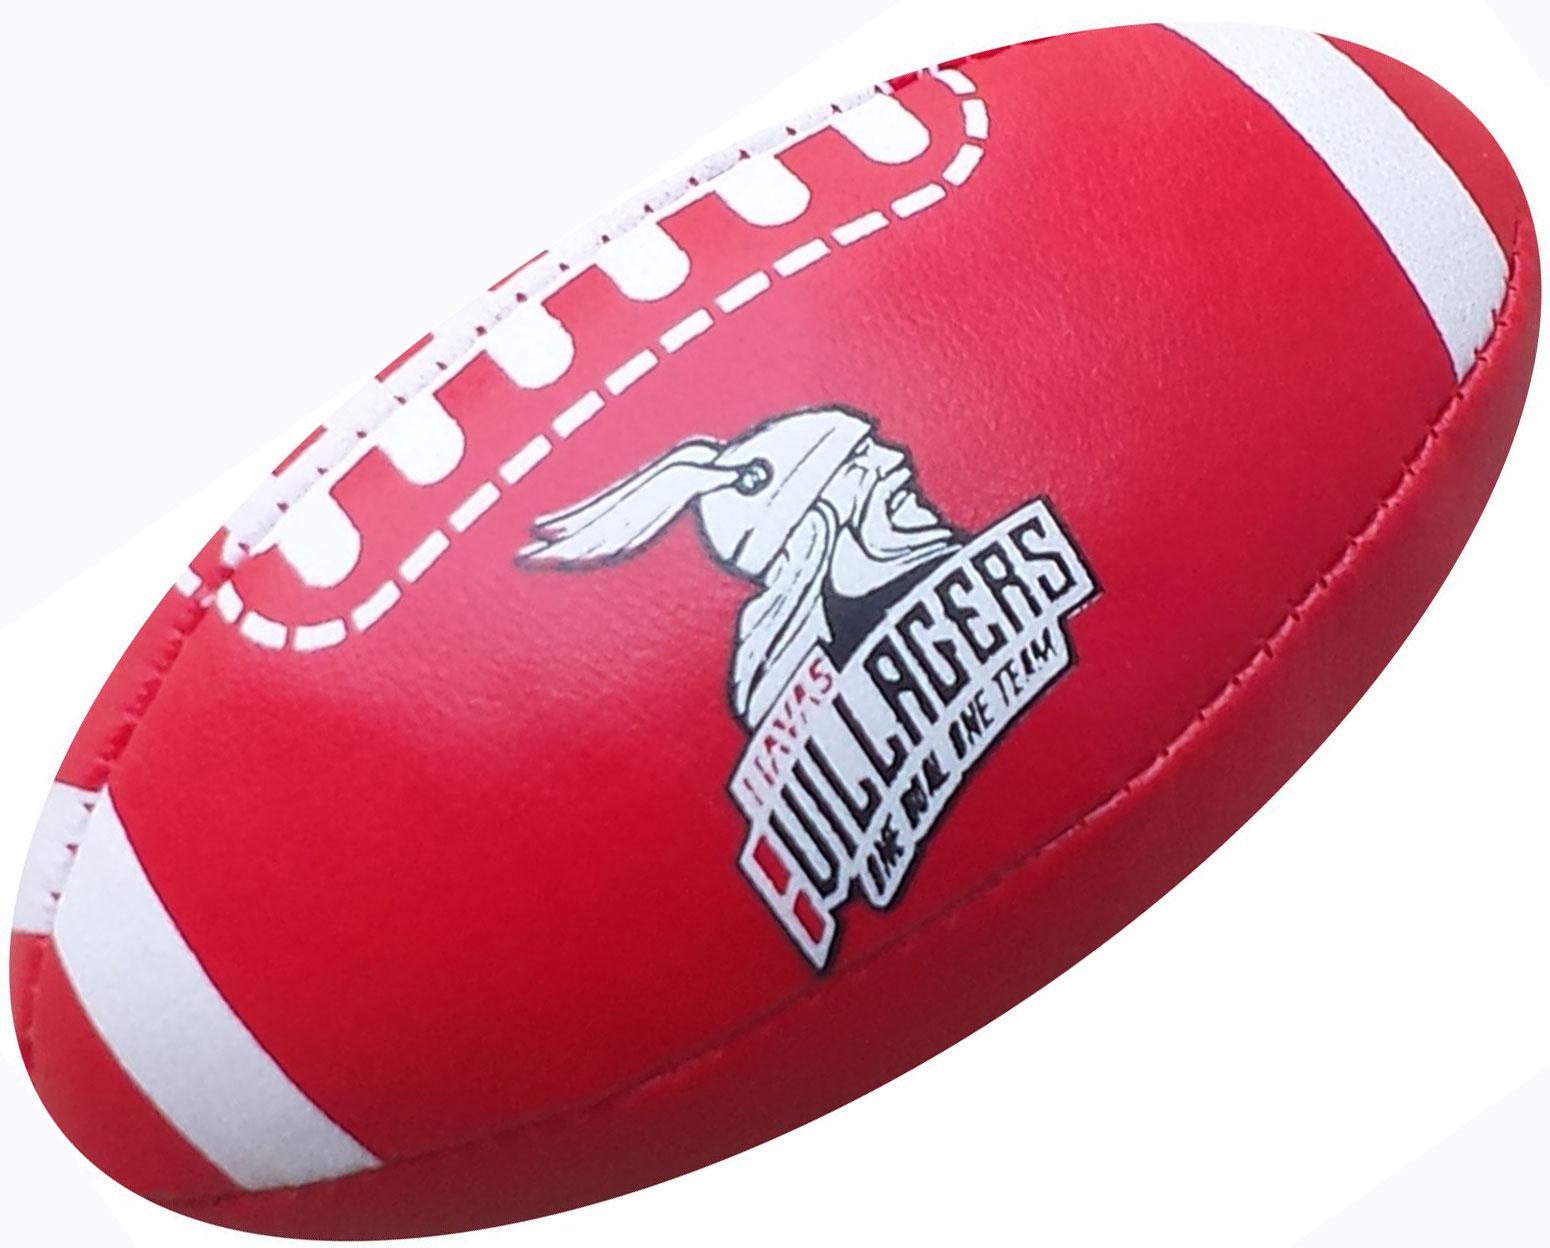 American Football Foam Ball Zoom